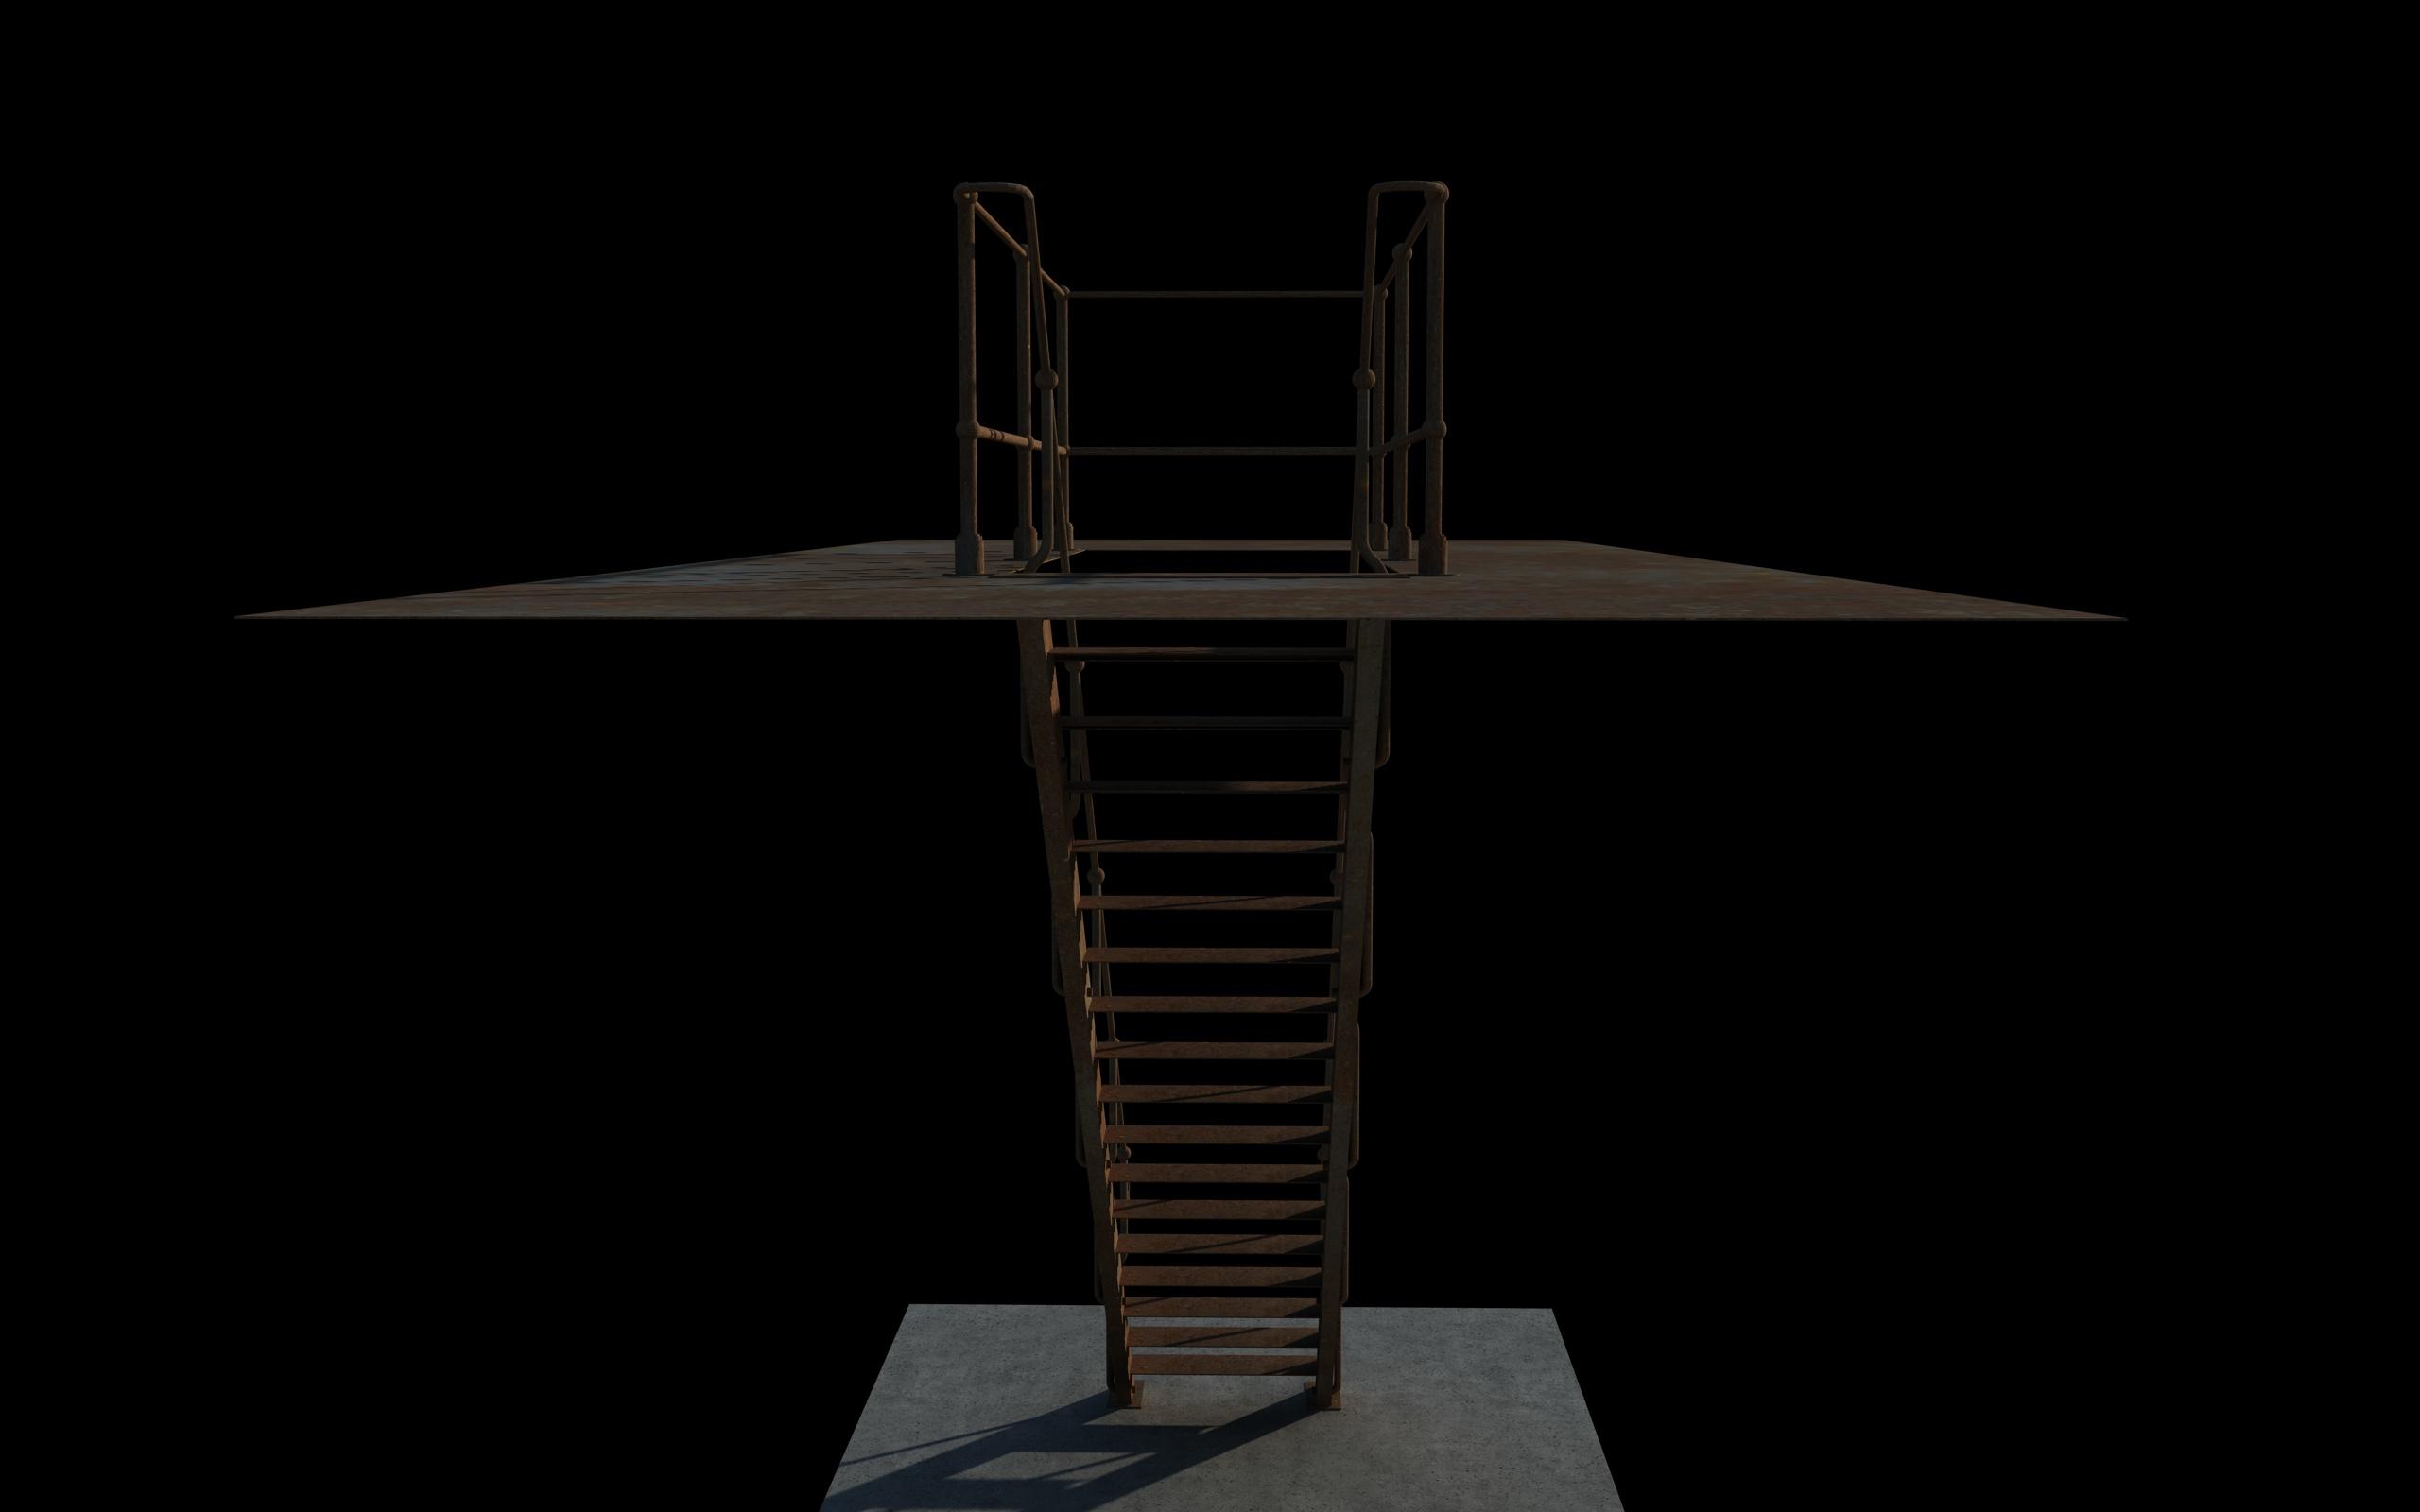 iron stair 3d obj 3d model 3ds dxf c4d skp obj 148390